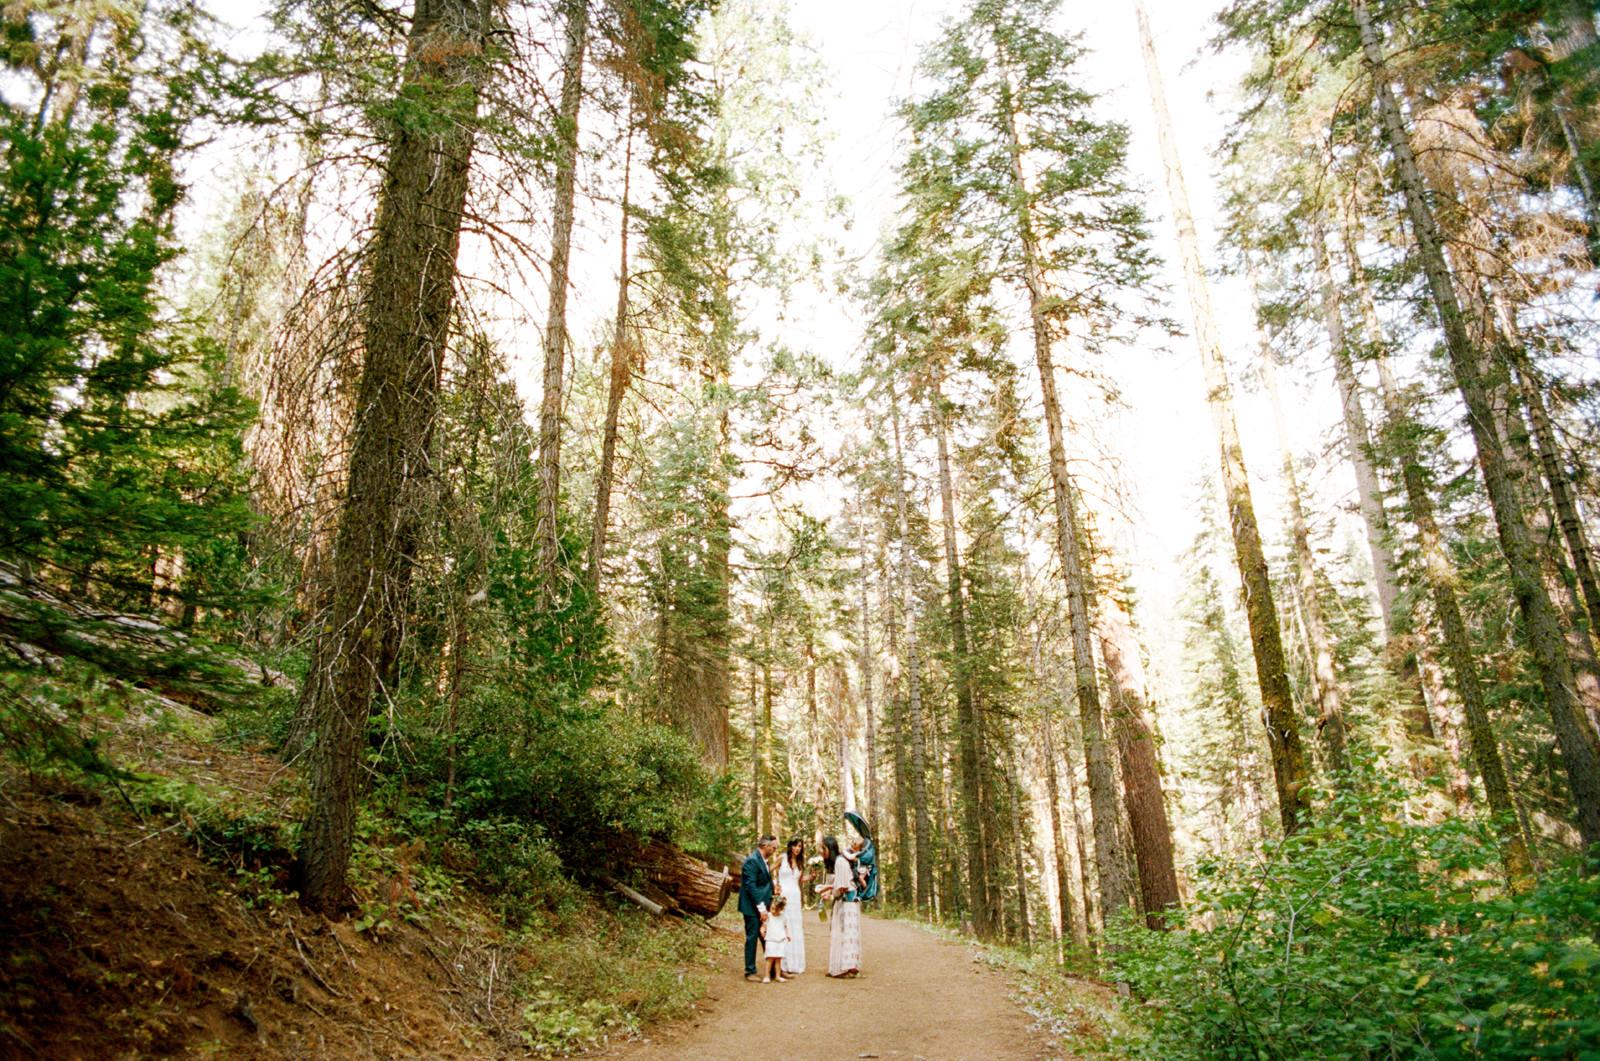 yosemite-intimate-wedding-038 YOSEMITE INTIMATE WEDDING